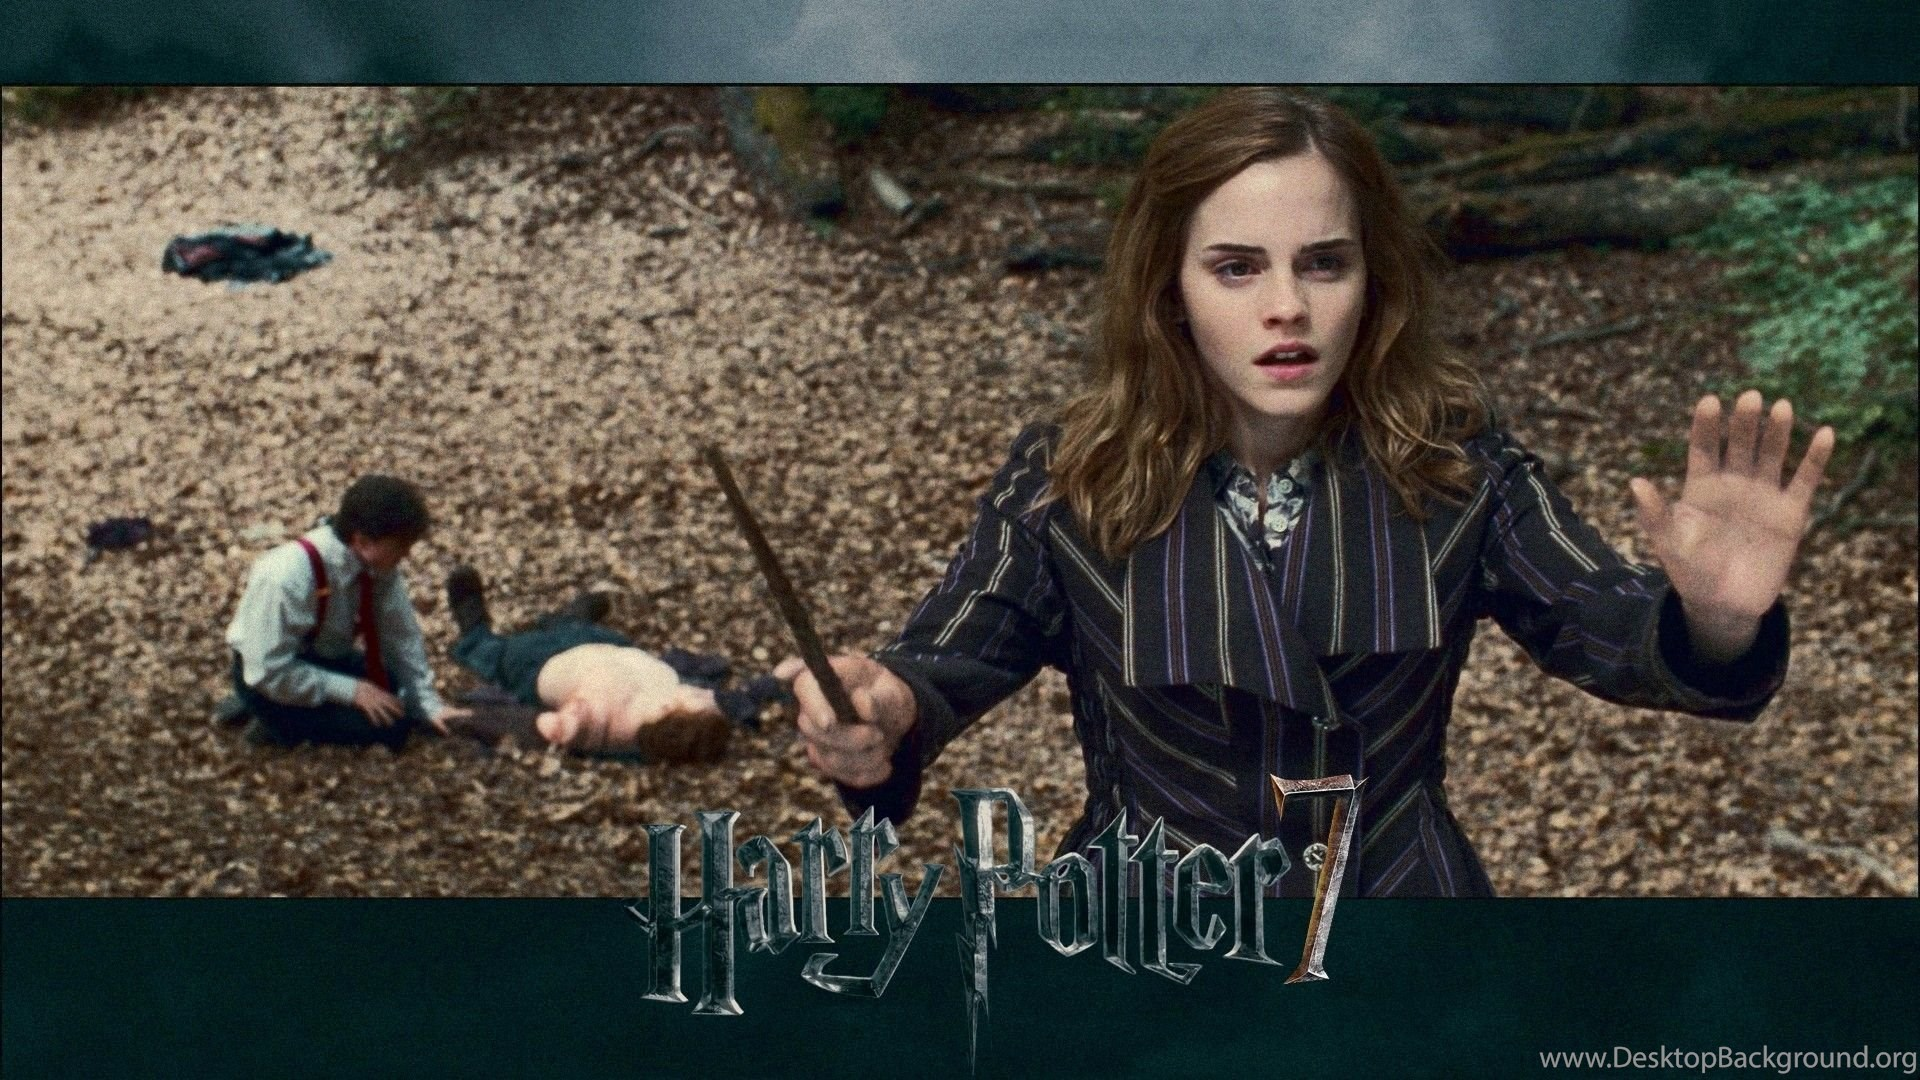 Harry Potter Wallpapers Free Full HD Wallpaper Widescreen HQ